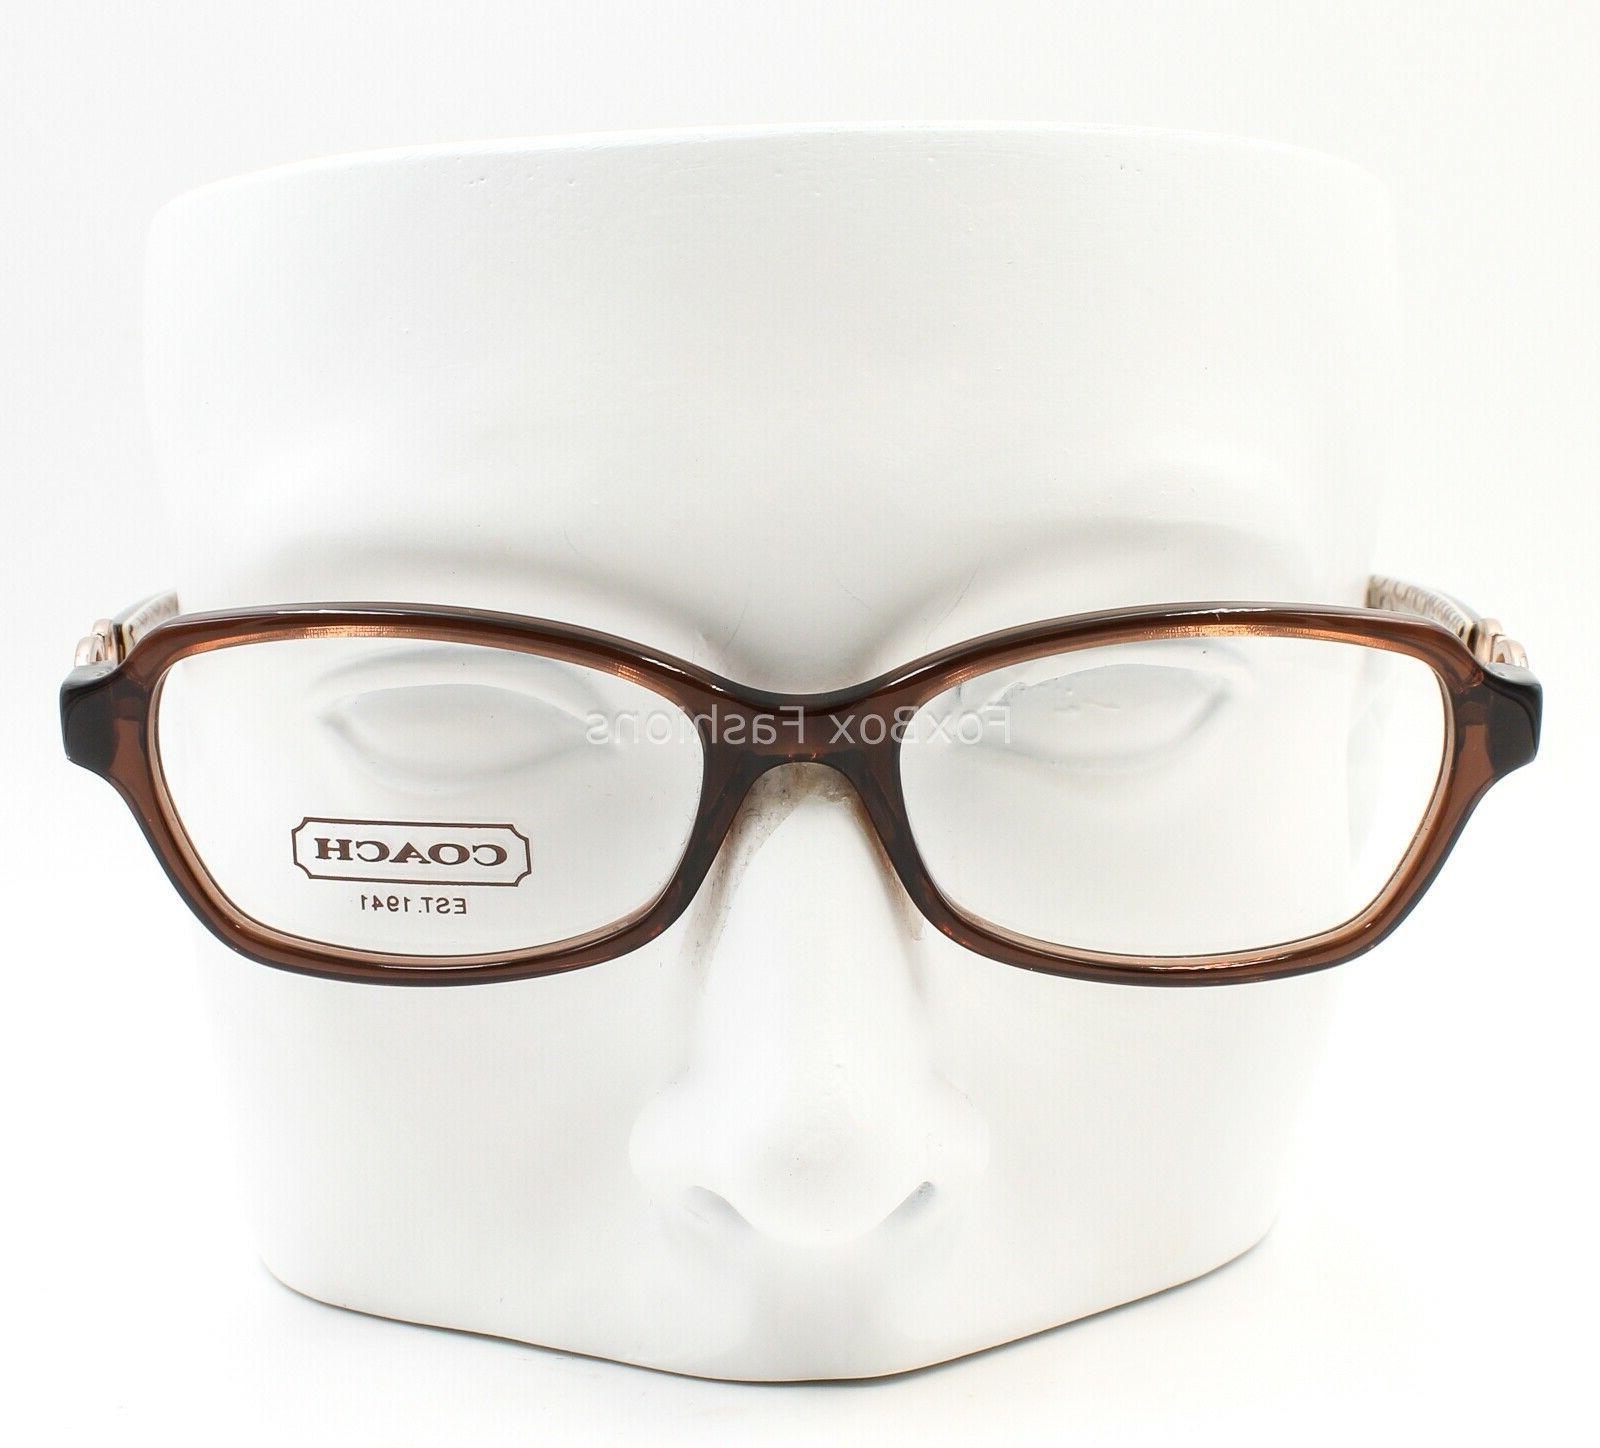 COACH HC 6017 5059 Vanessa Eyeglasses Brown